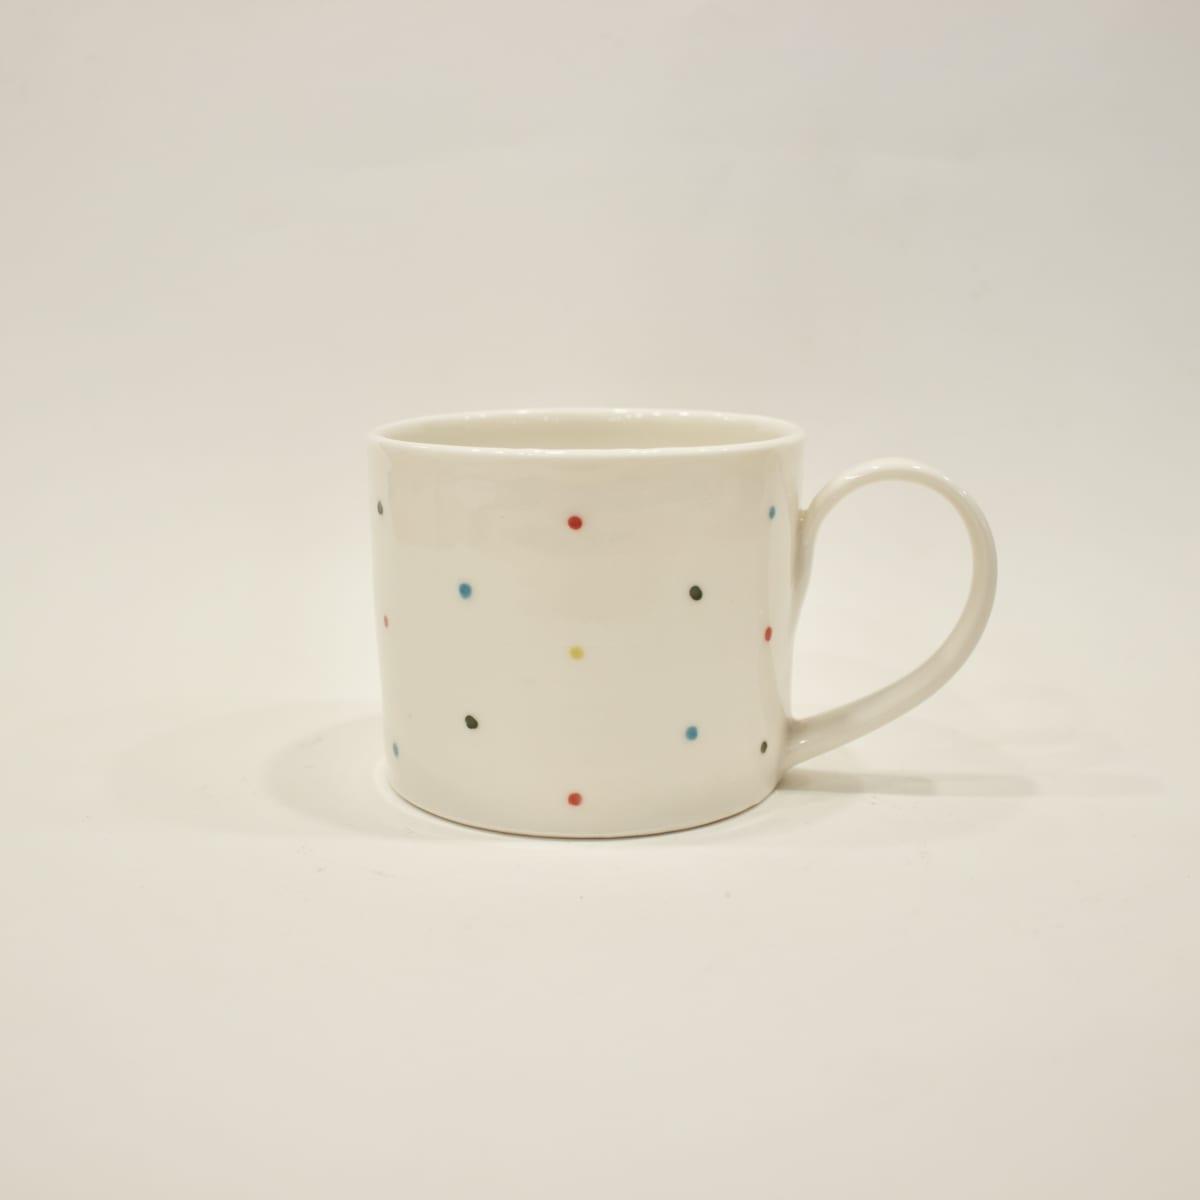 Abigail North Multispot Mug, 2019 Ceramic 7 x 13 x 9 cm 2 3/4 x 5 1/8 x 3 1/2 in